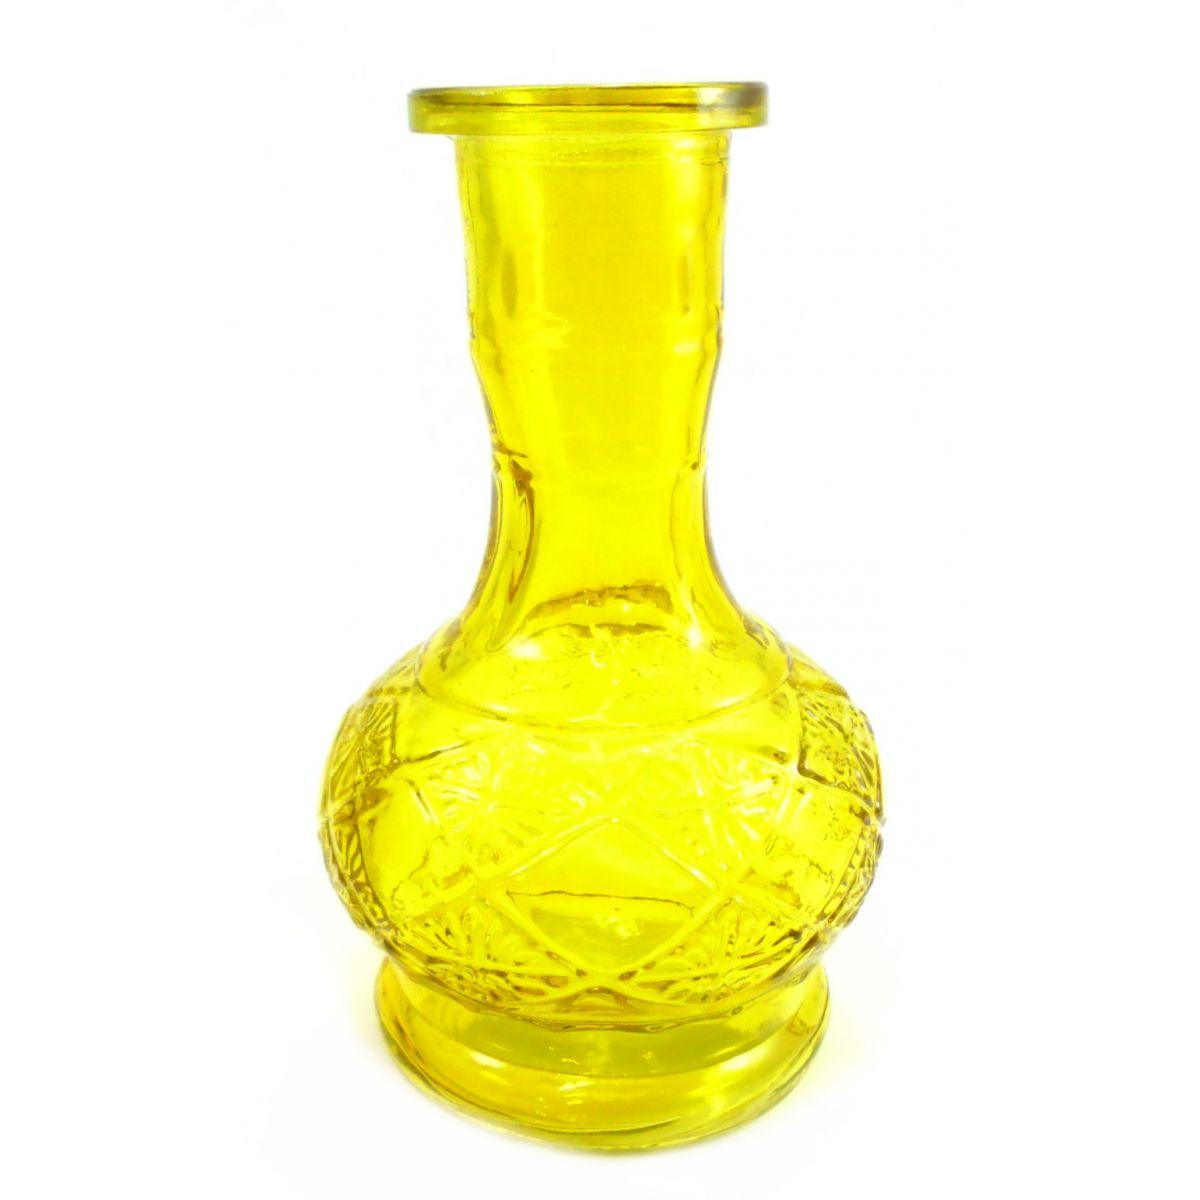 Vaso/base para narguile de encaixar grande moldado, 20 cm de altura. Várias cores.